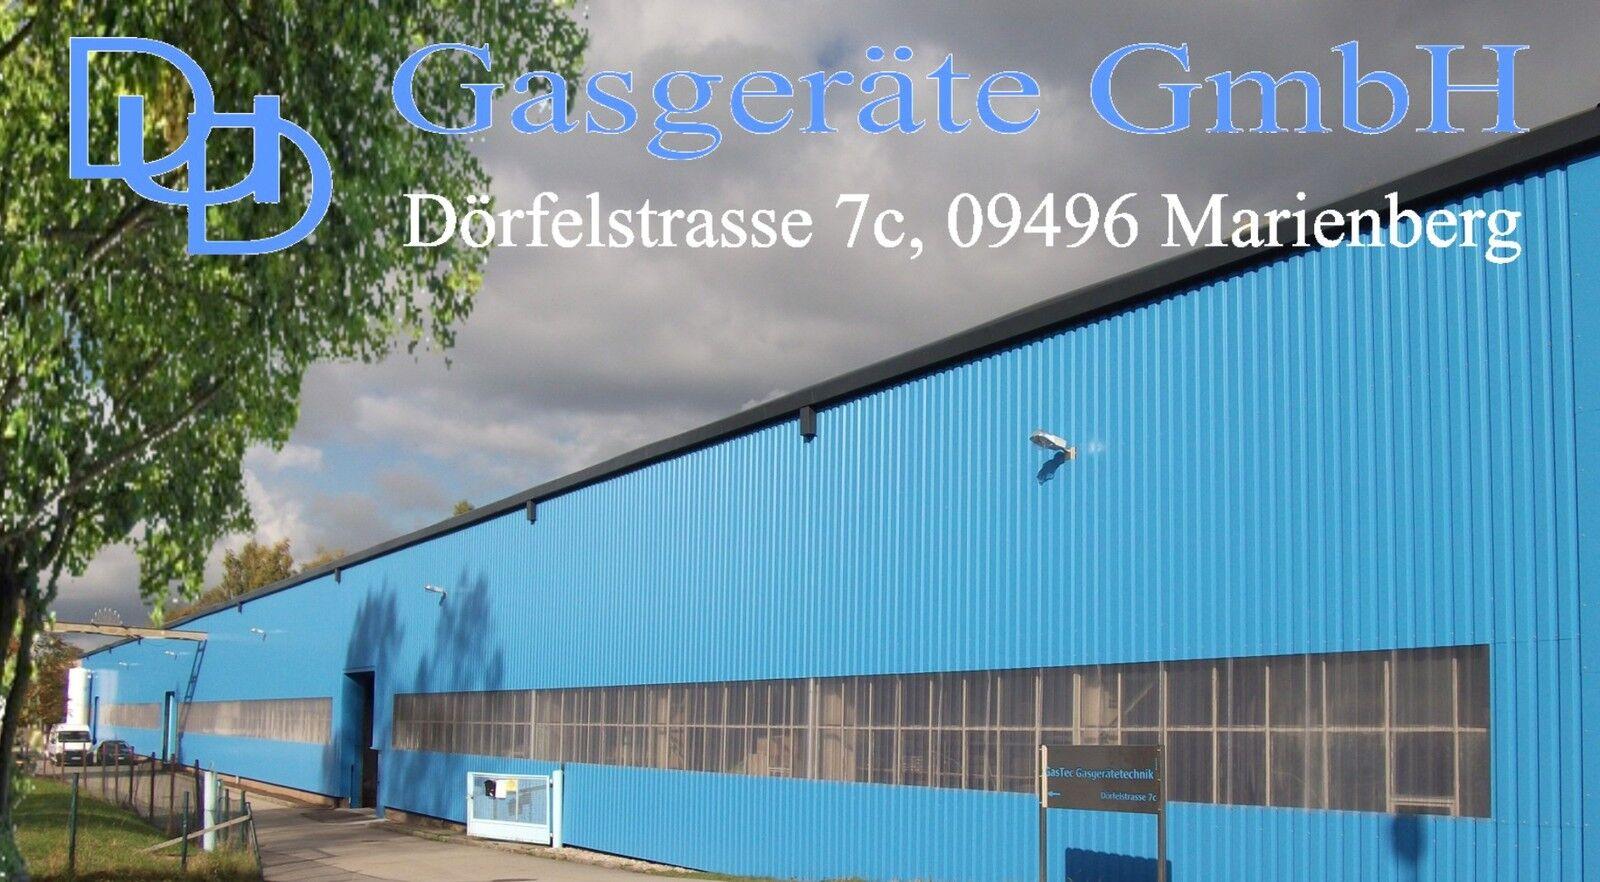 DuD Gasgeraete GmbH